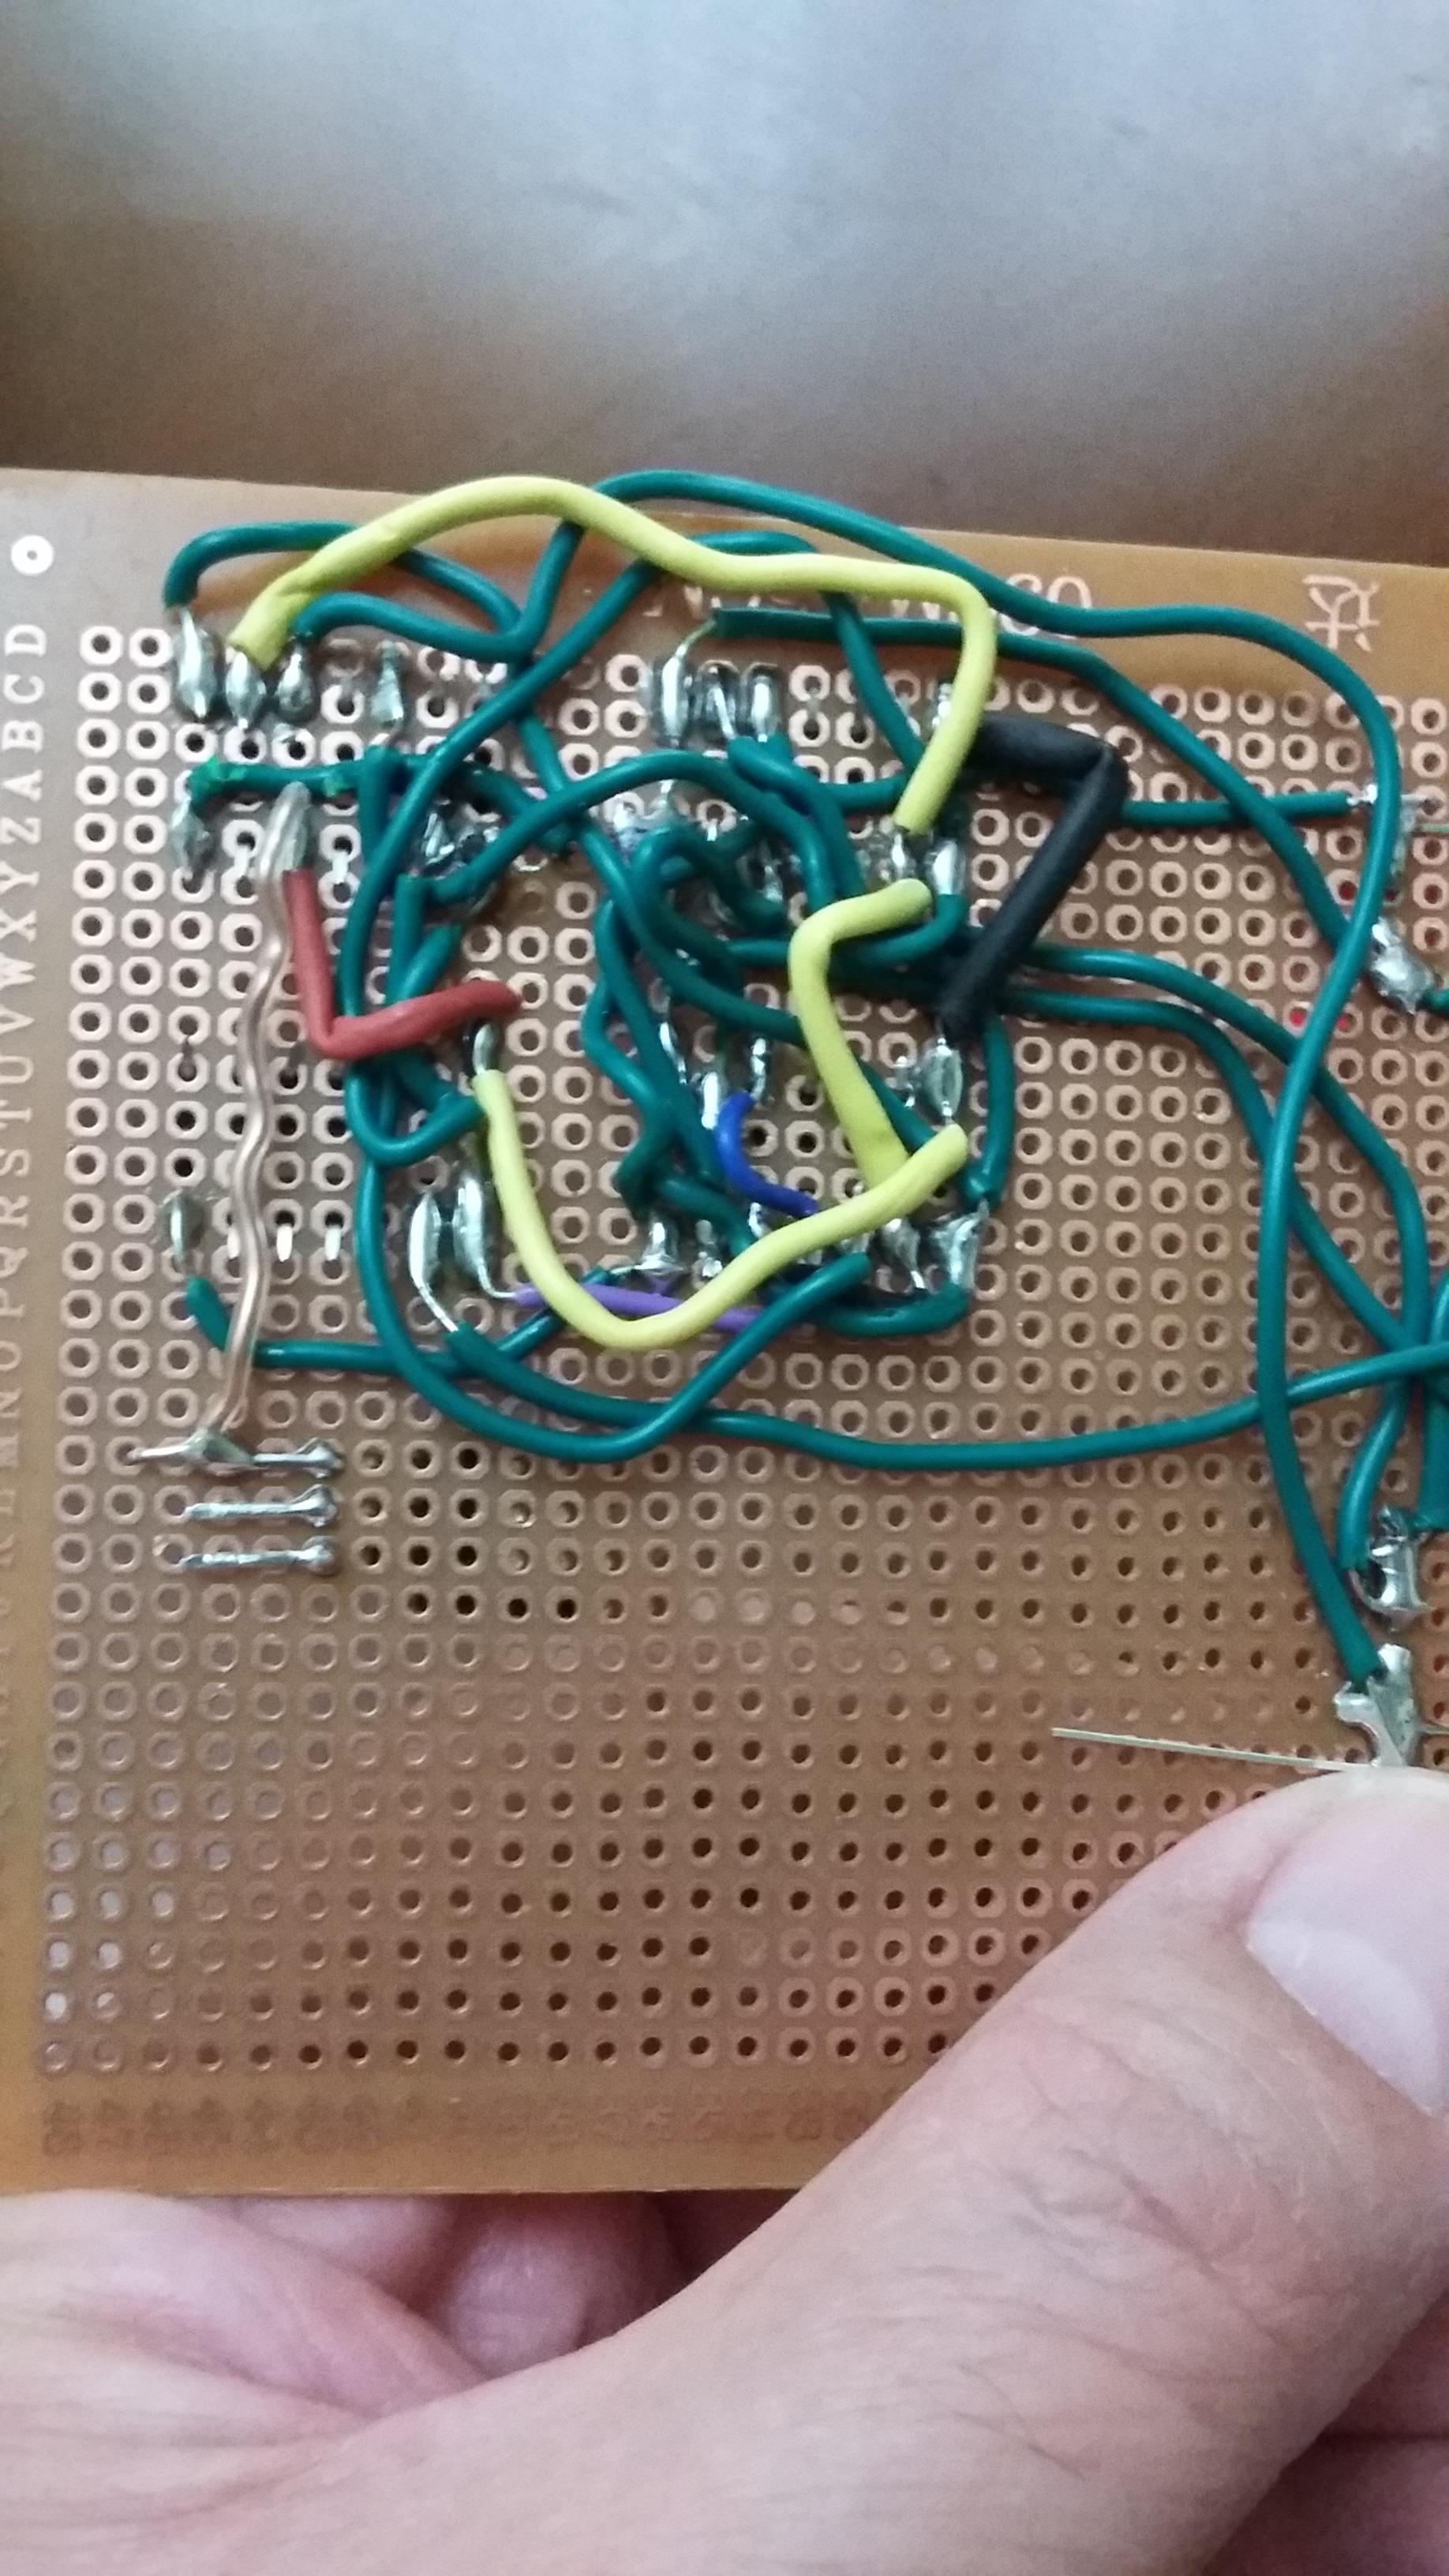 Picture of Installing the Standard Regulator 7805